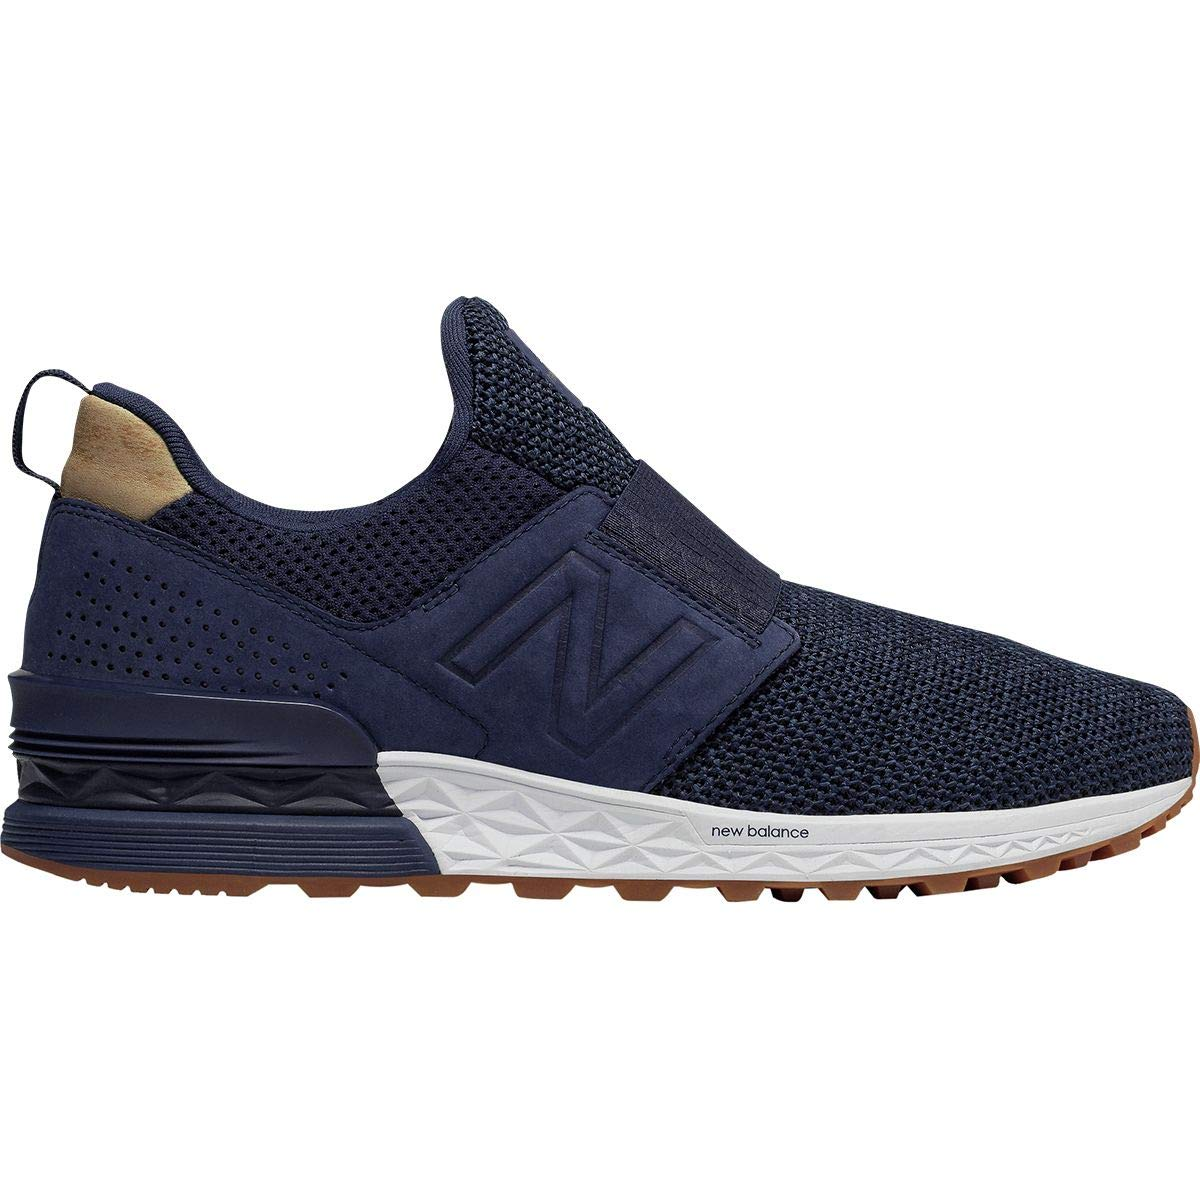 New Balance Technics 1200 chaussures à vendre